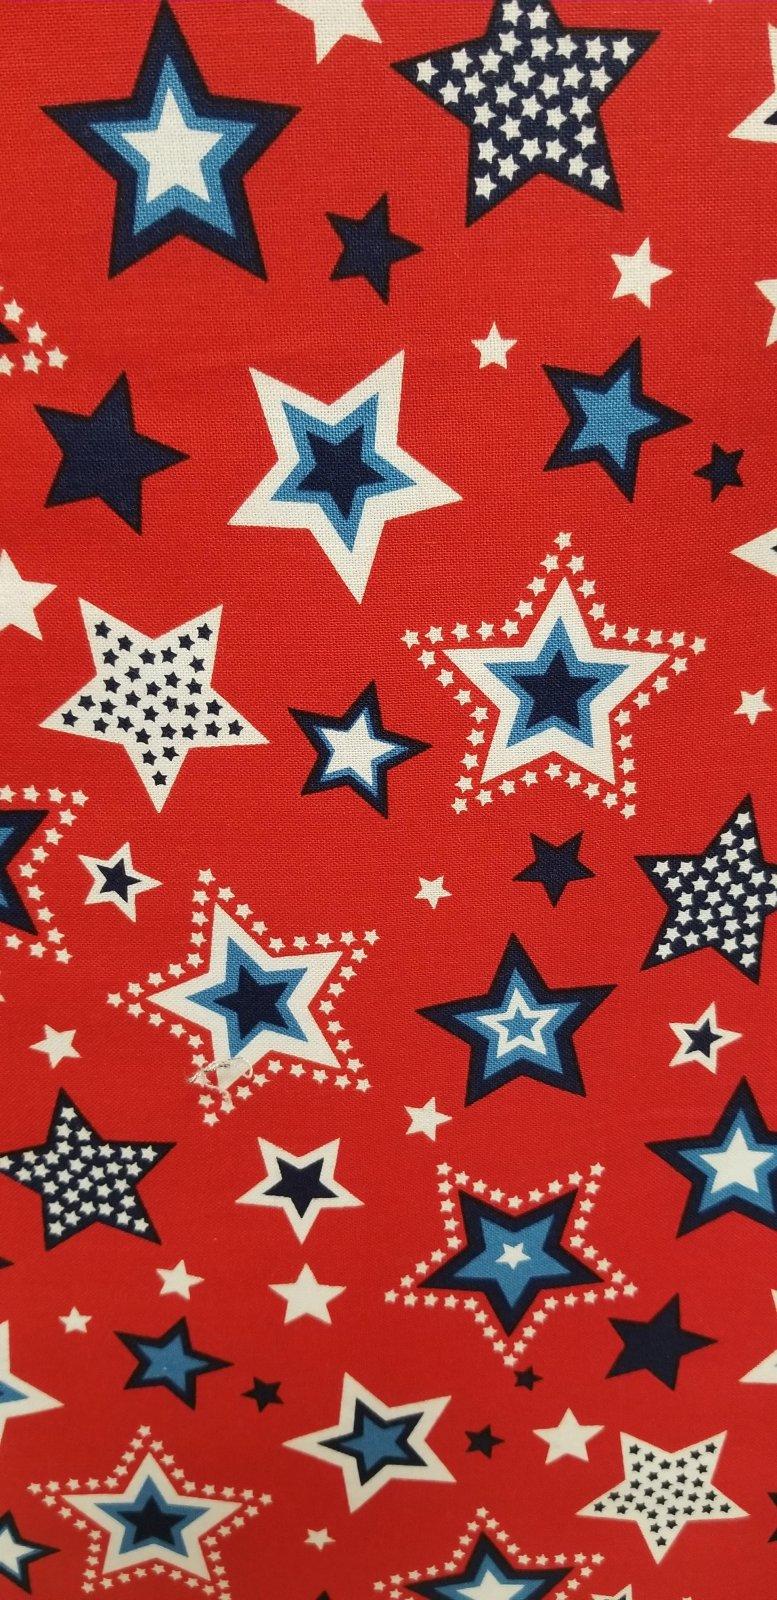 703081204366 Patriotic stars red